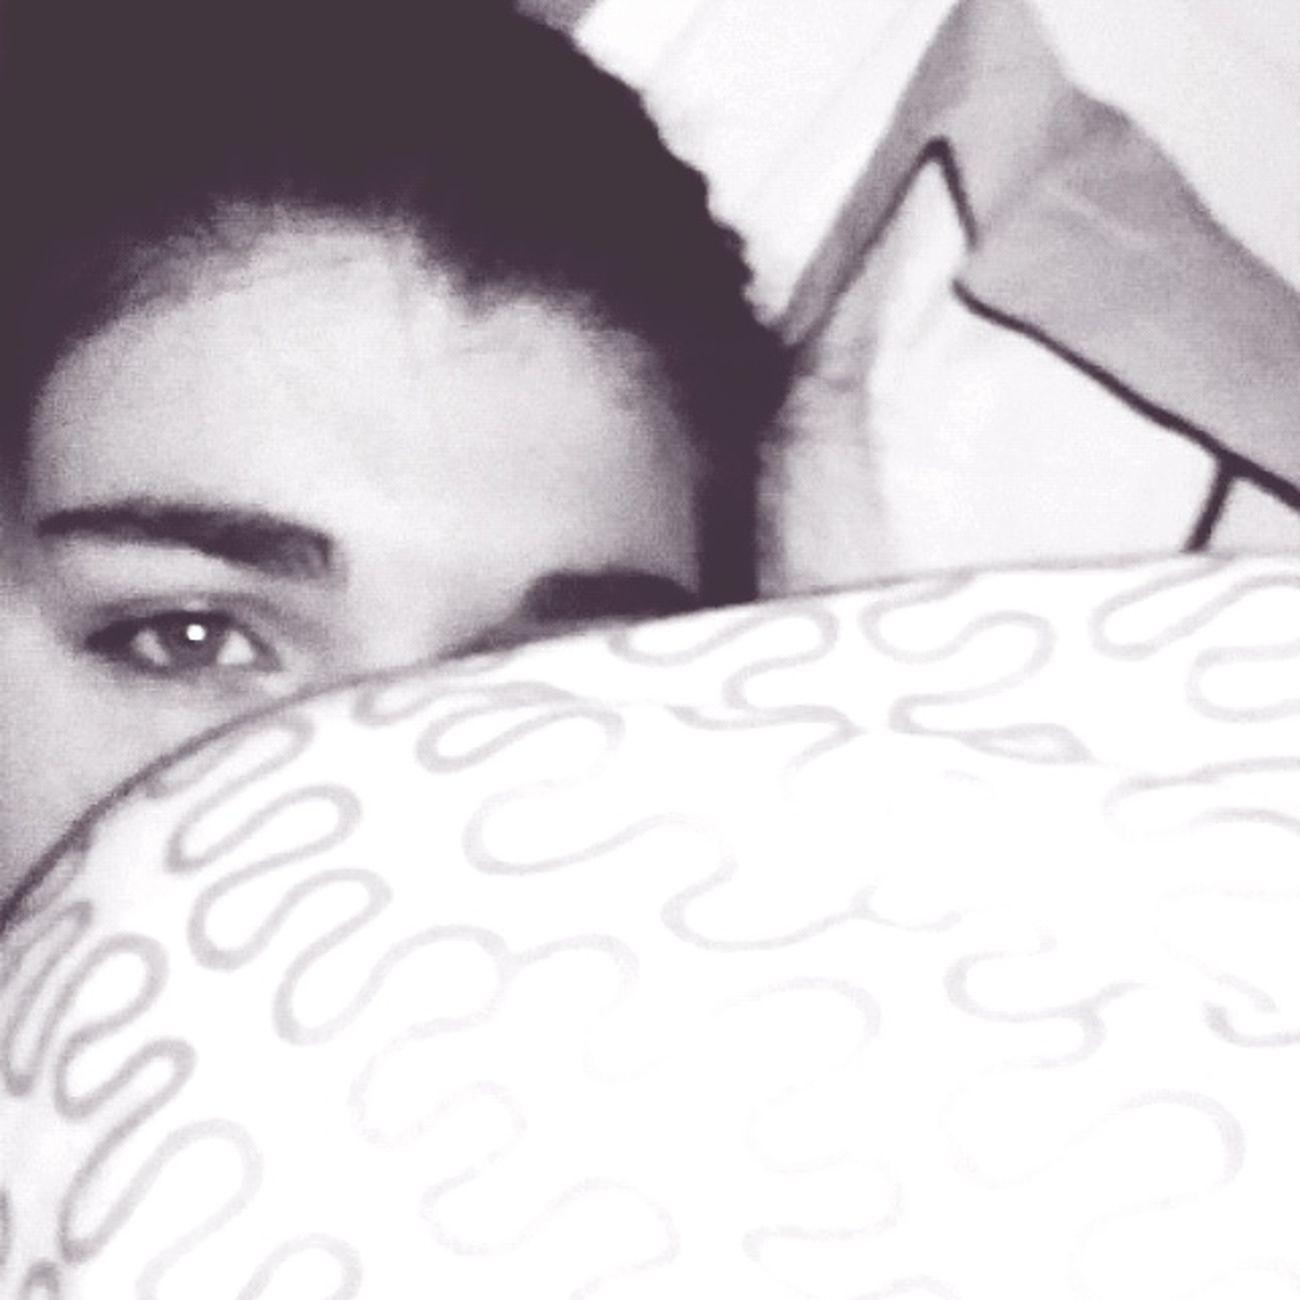 I need to sleep... Depois de um longo ensaio... Cansada Tired! Ineedtosleep GoodNight ❤✌